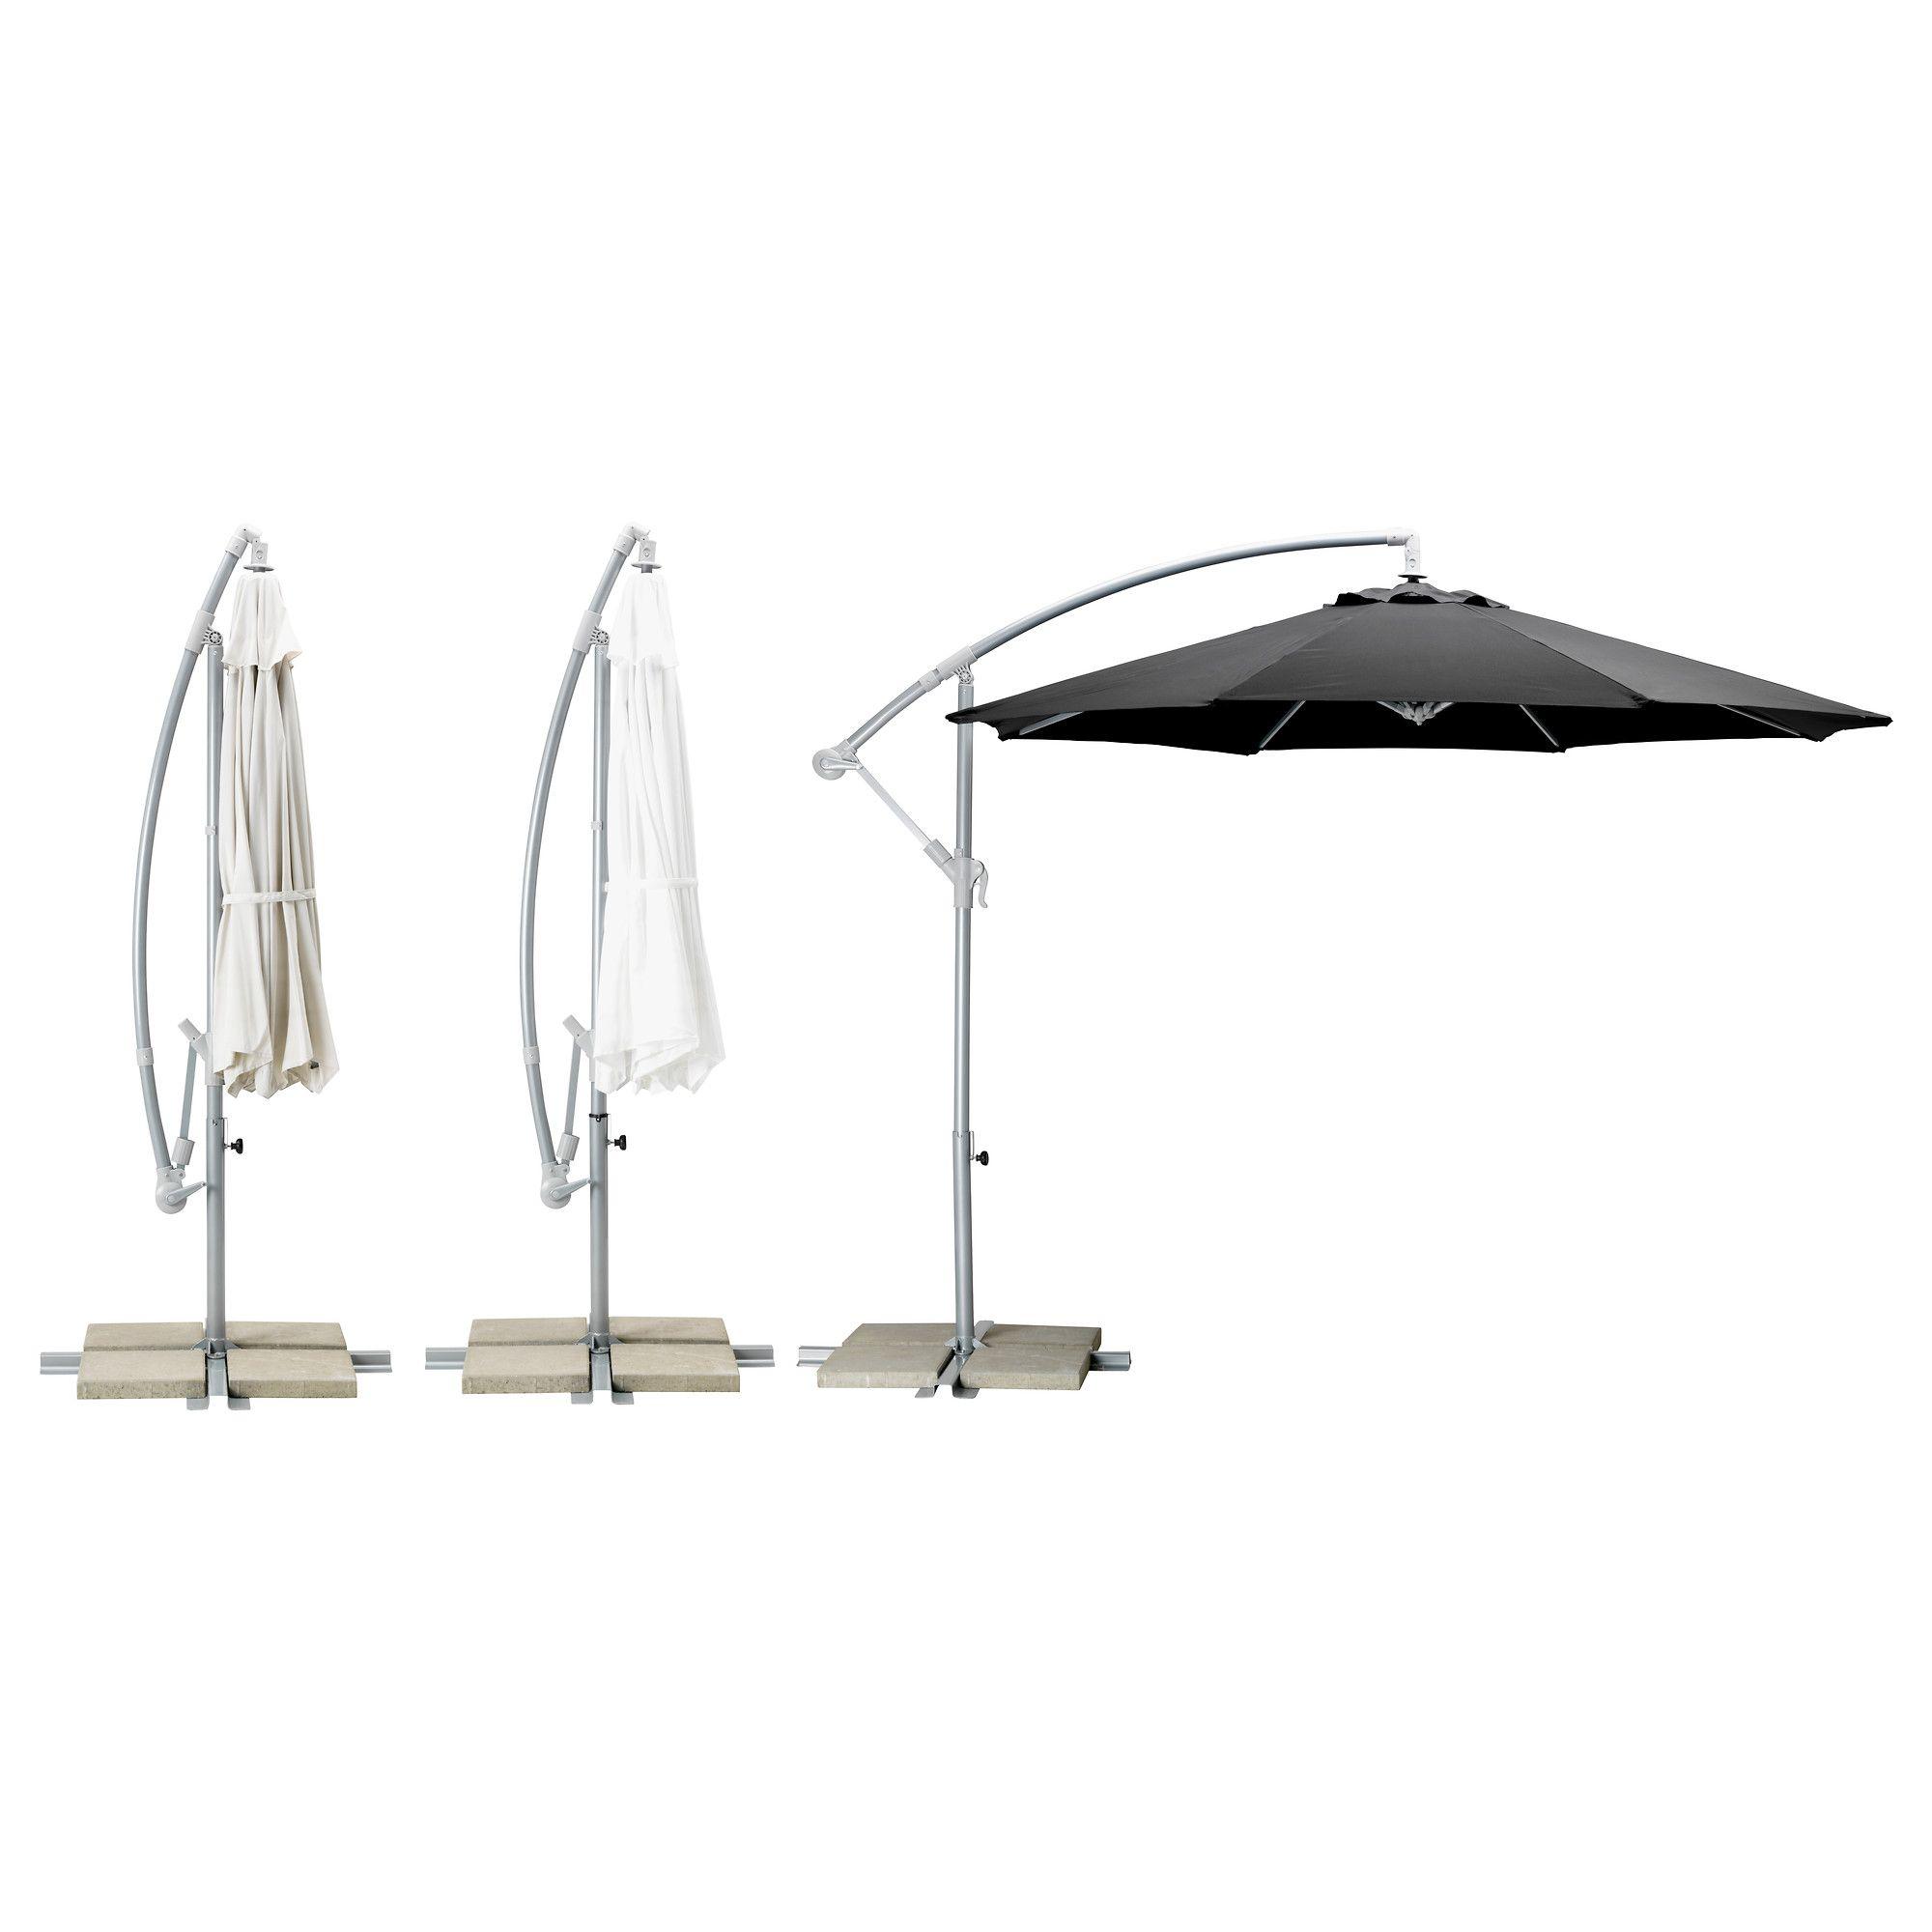 karls parasol d port ikea parasol en attendant pergola pinterest terrasses et ext rieur. Black Bedroom Furniture Sets. Home Design Ideas